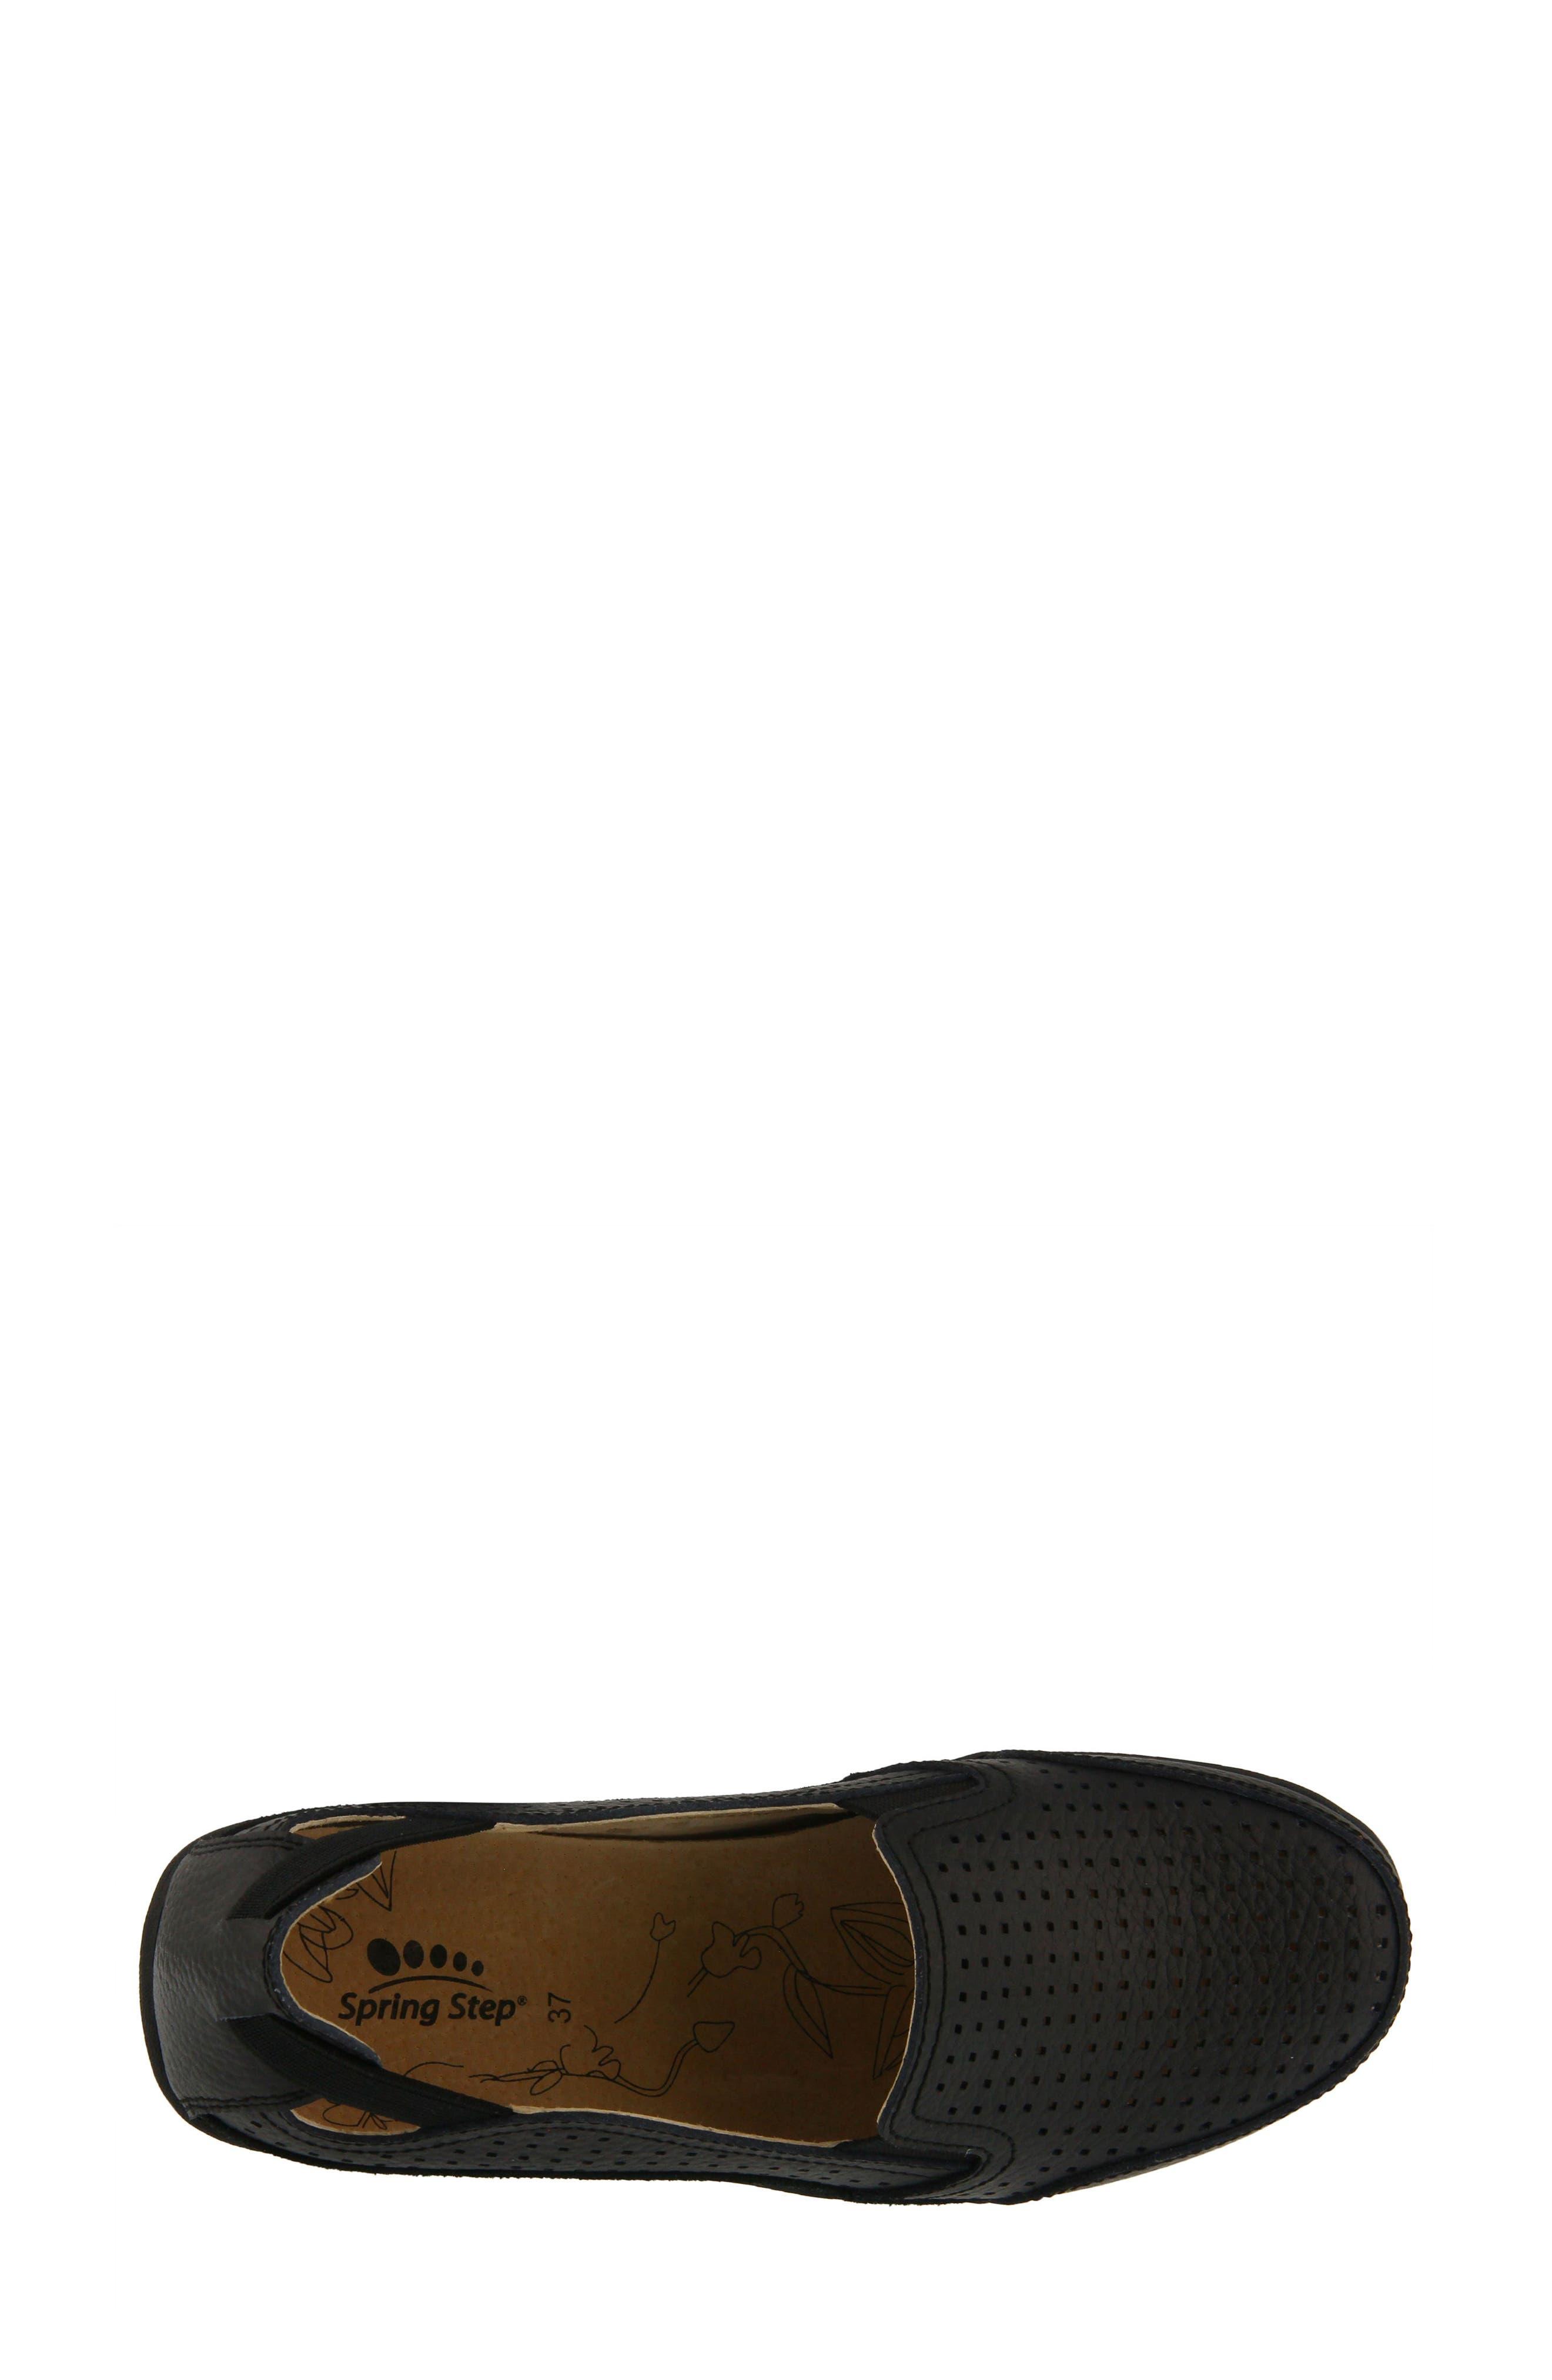 Juhi Loafer,                             Alternate thumbnail 4, color,                             BLACK LEATHER